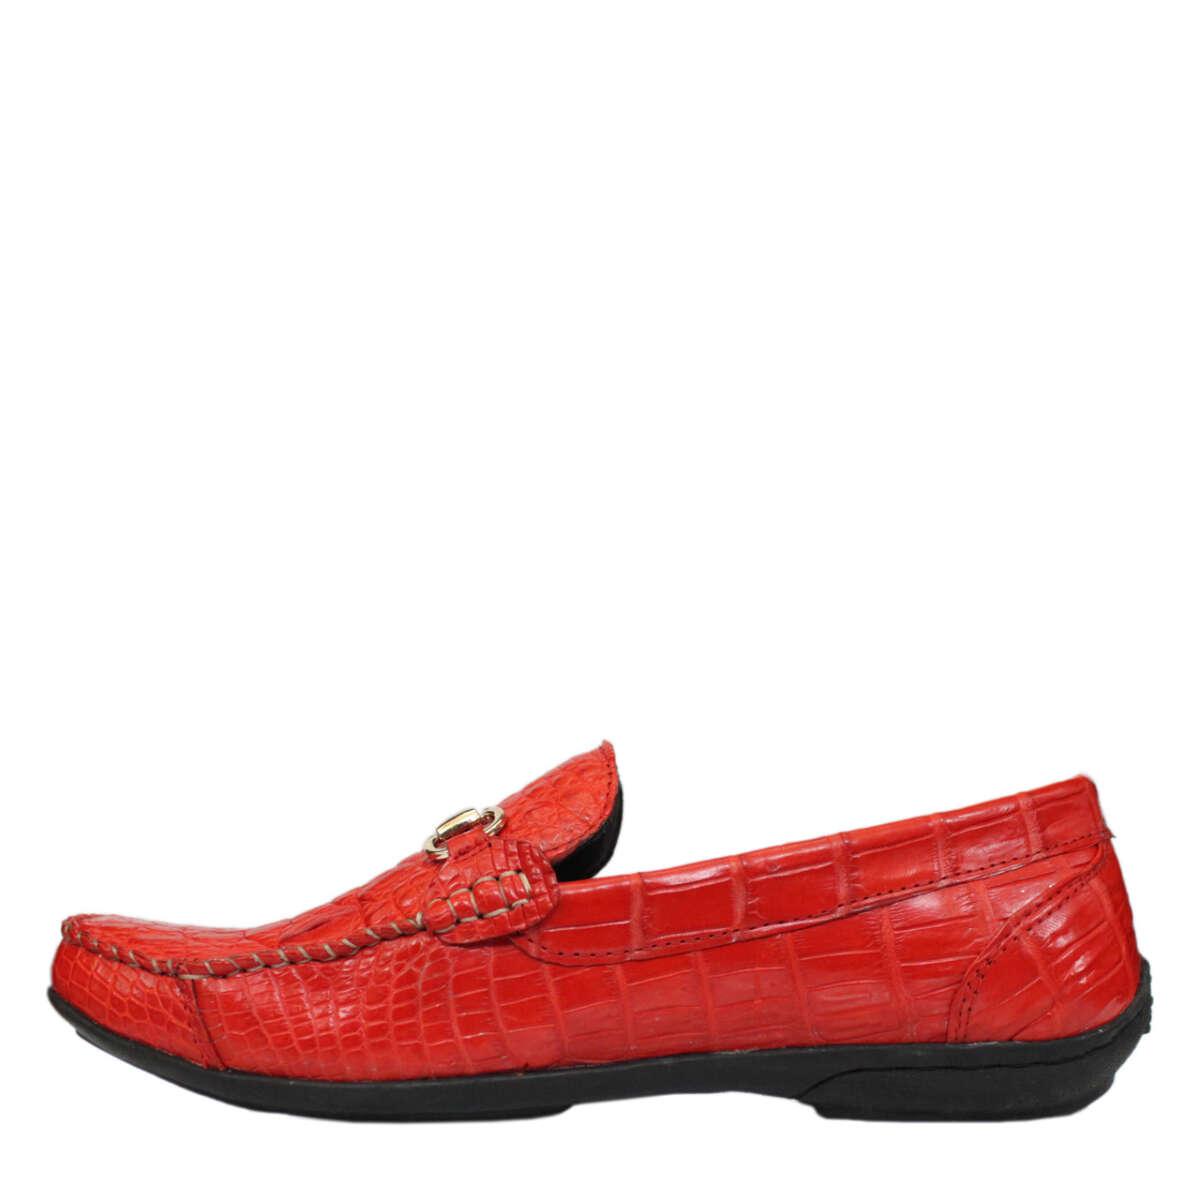 Giày nam da cá sấu S866a